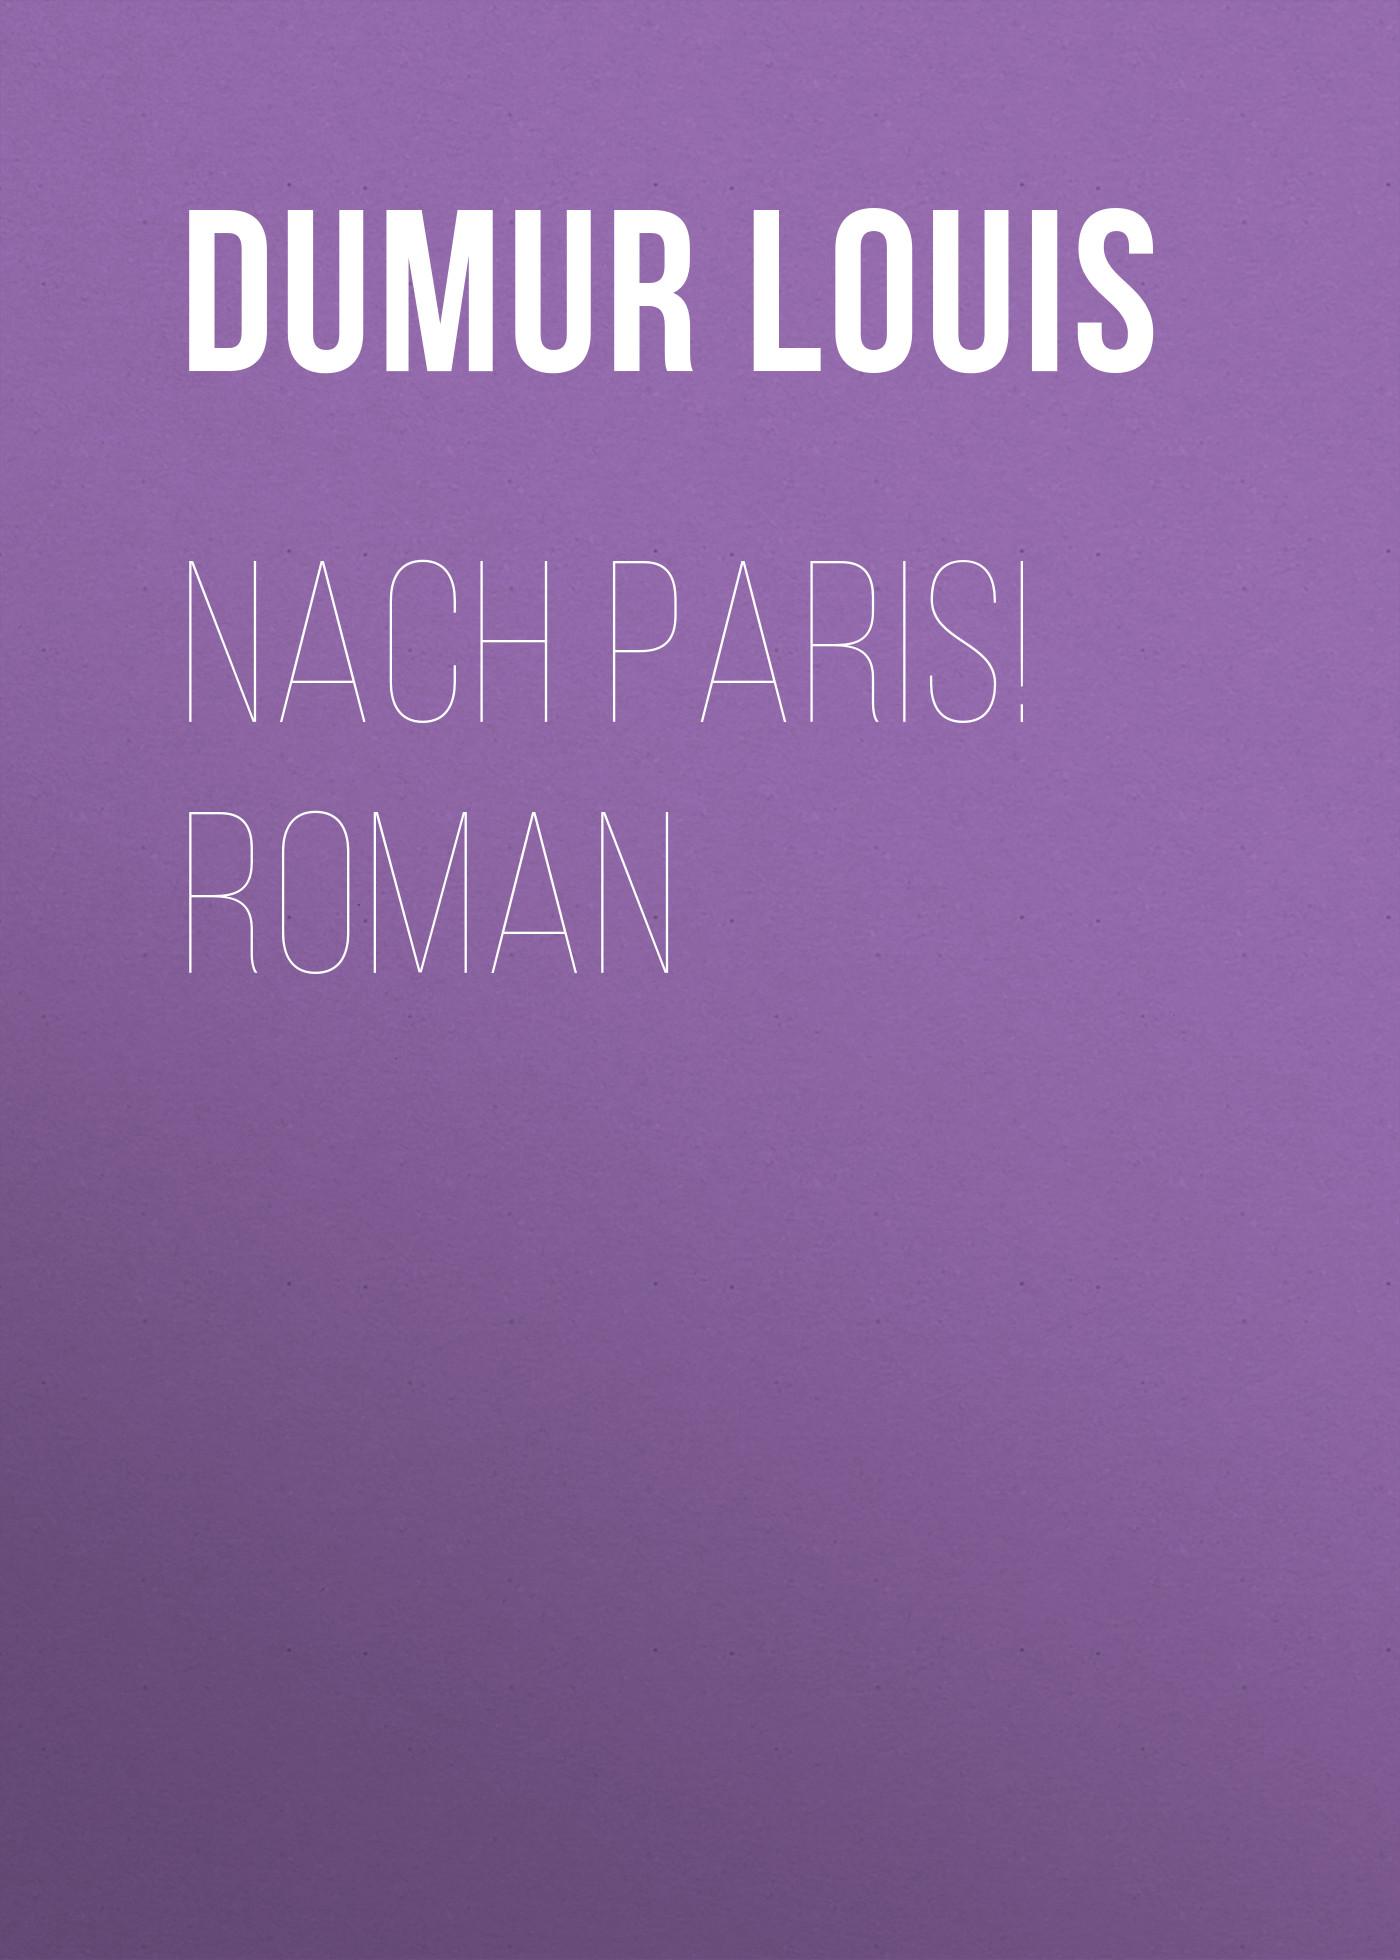 Dumur Louis Nach Paris! Roman